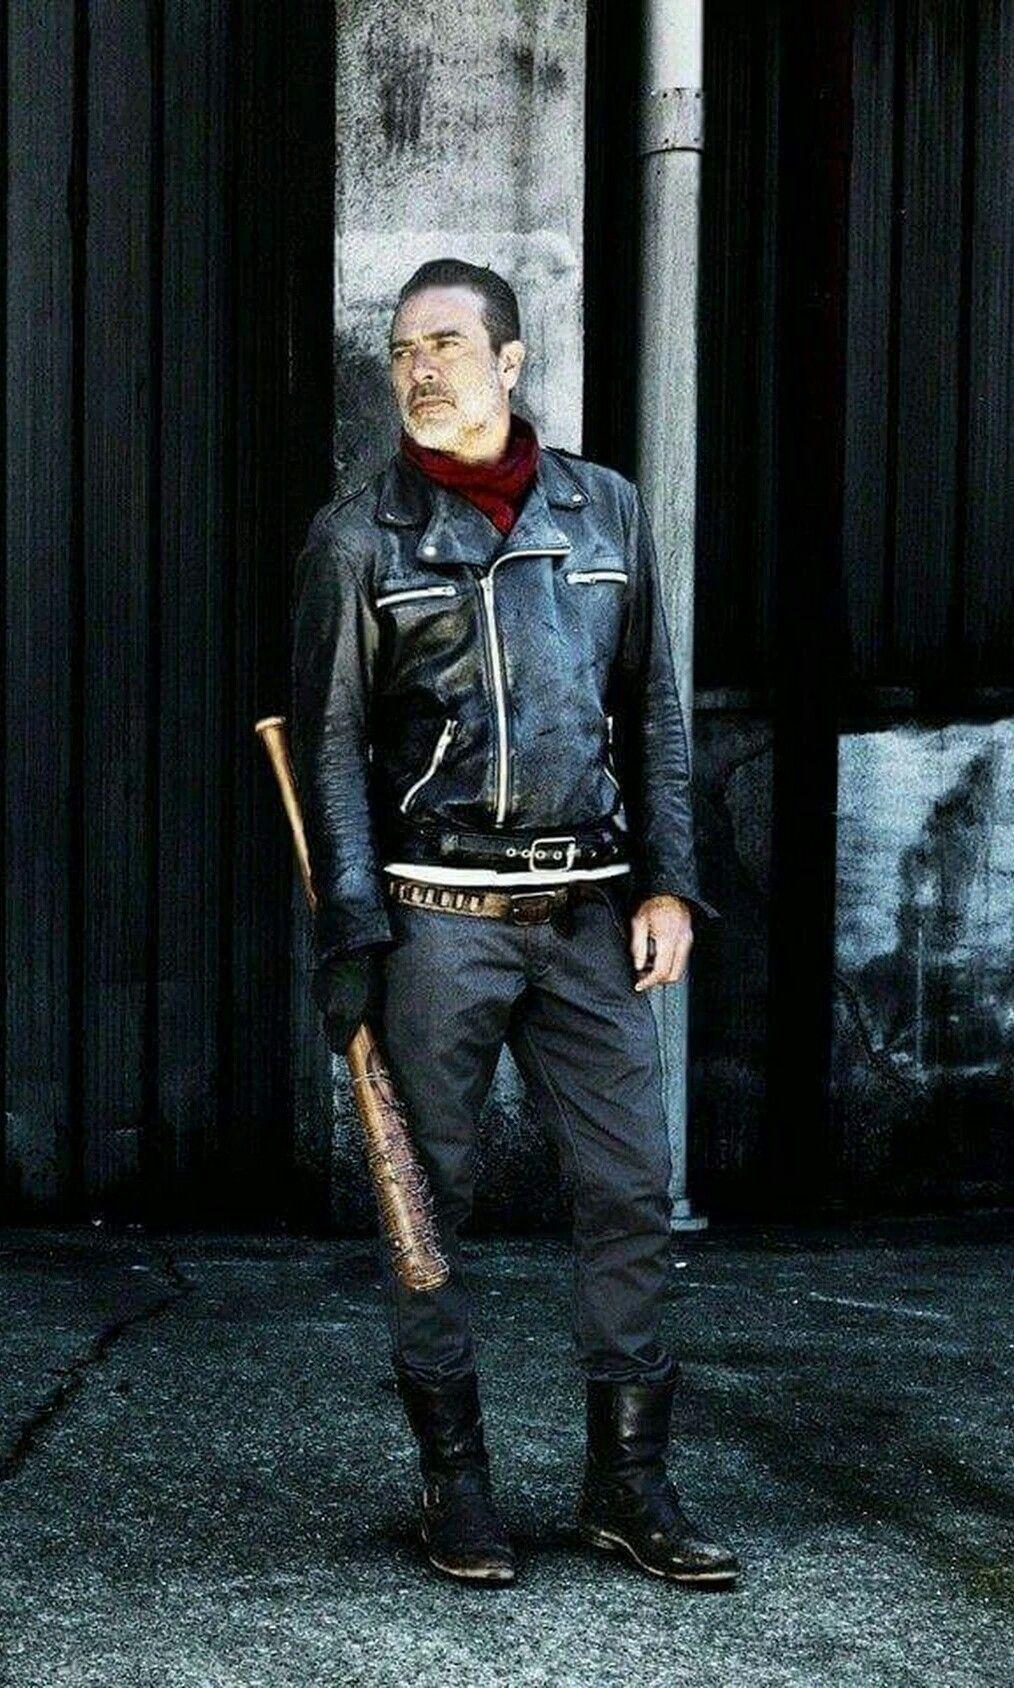 Pin de Martina em The Walking Dead | The walking dead